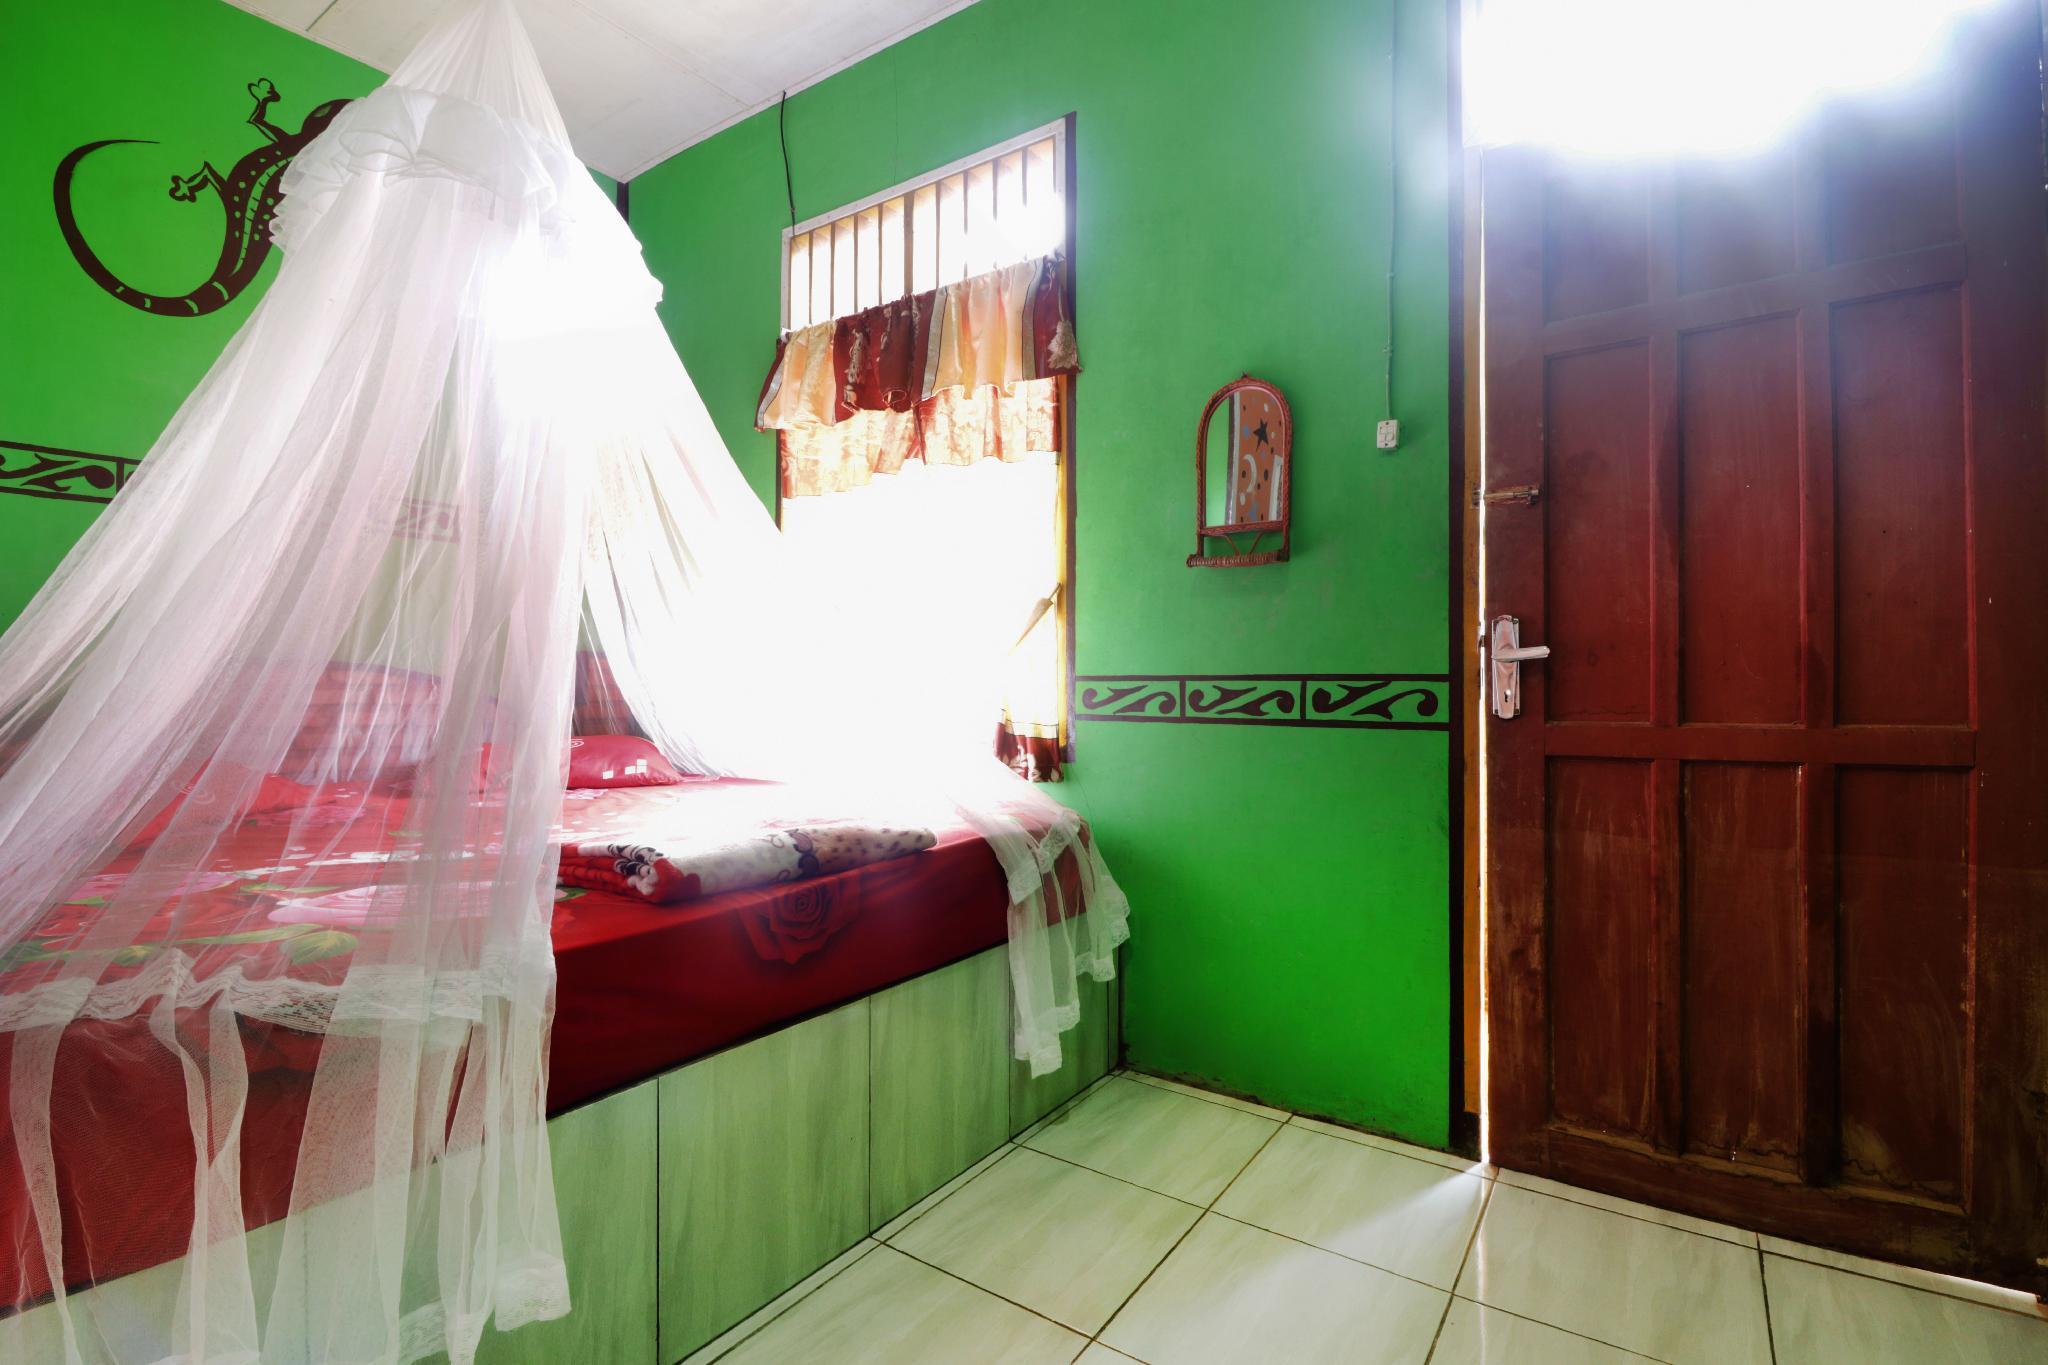 Tiga Dara Guest House